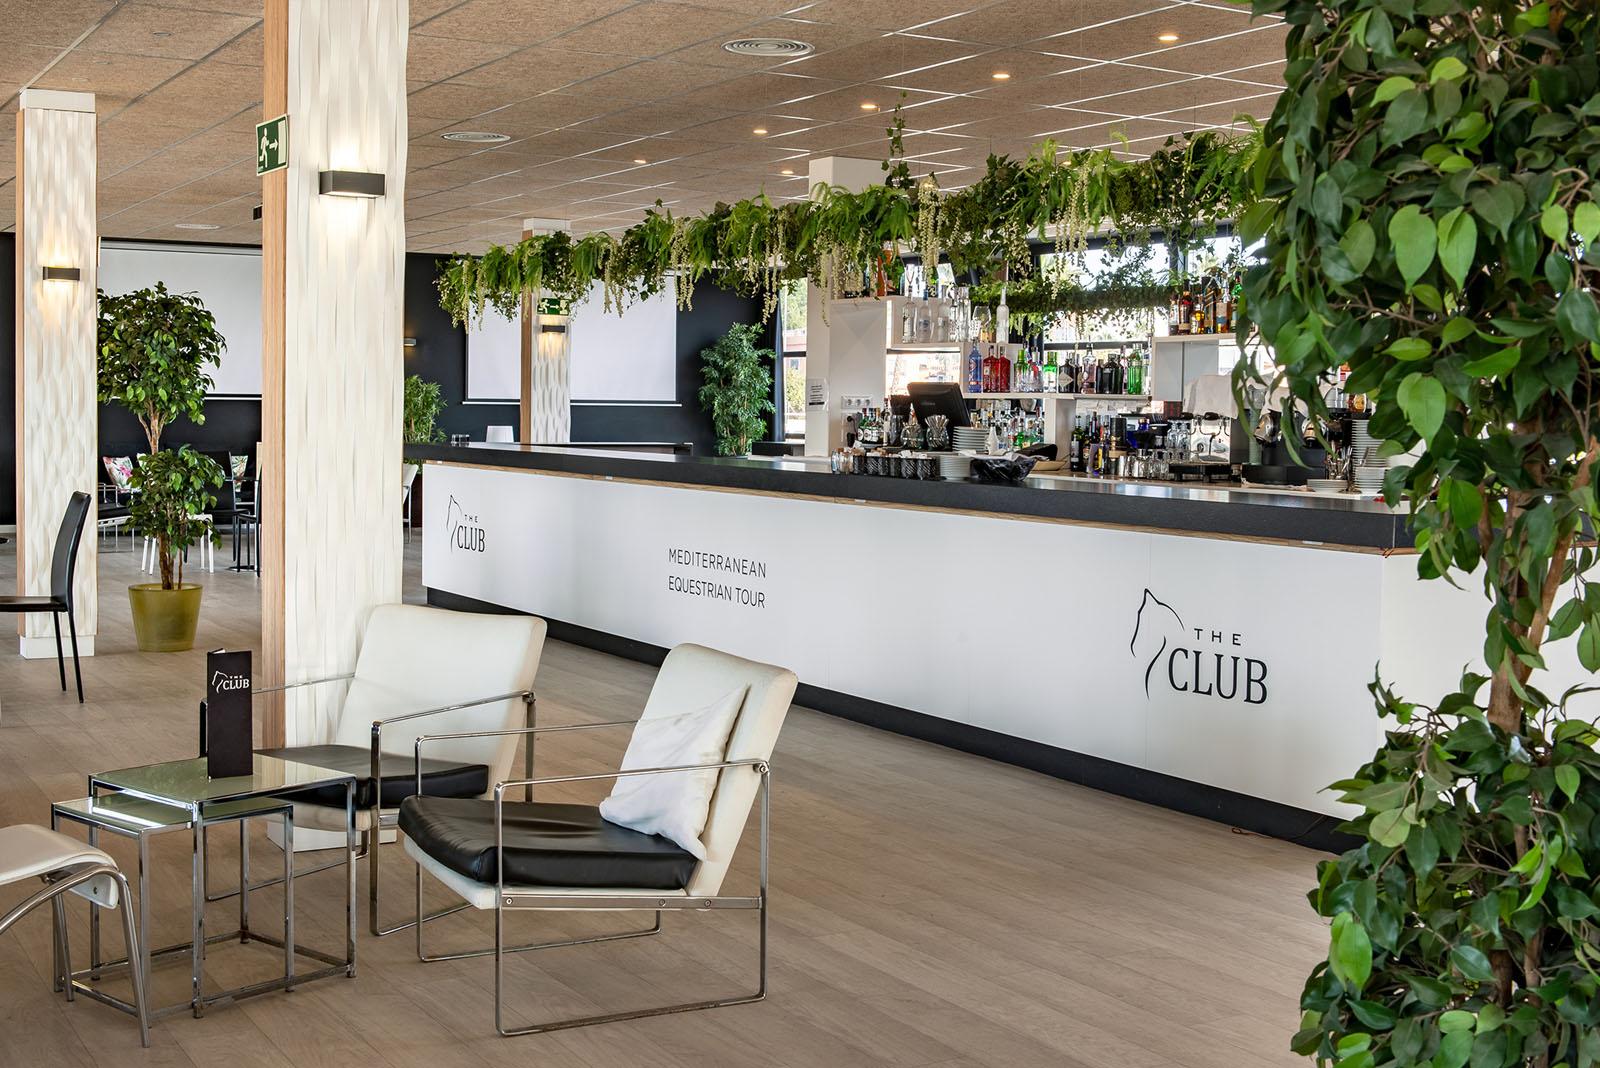 the-club-met-oliva-by-adolfogosálvez